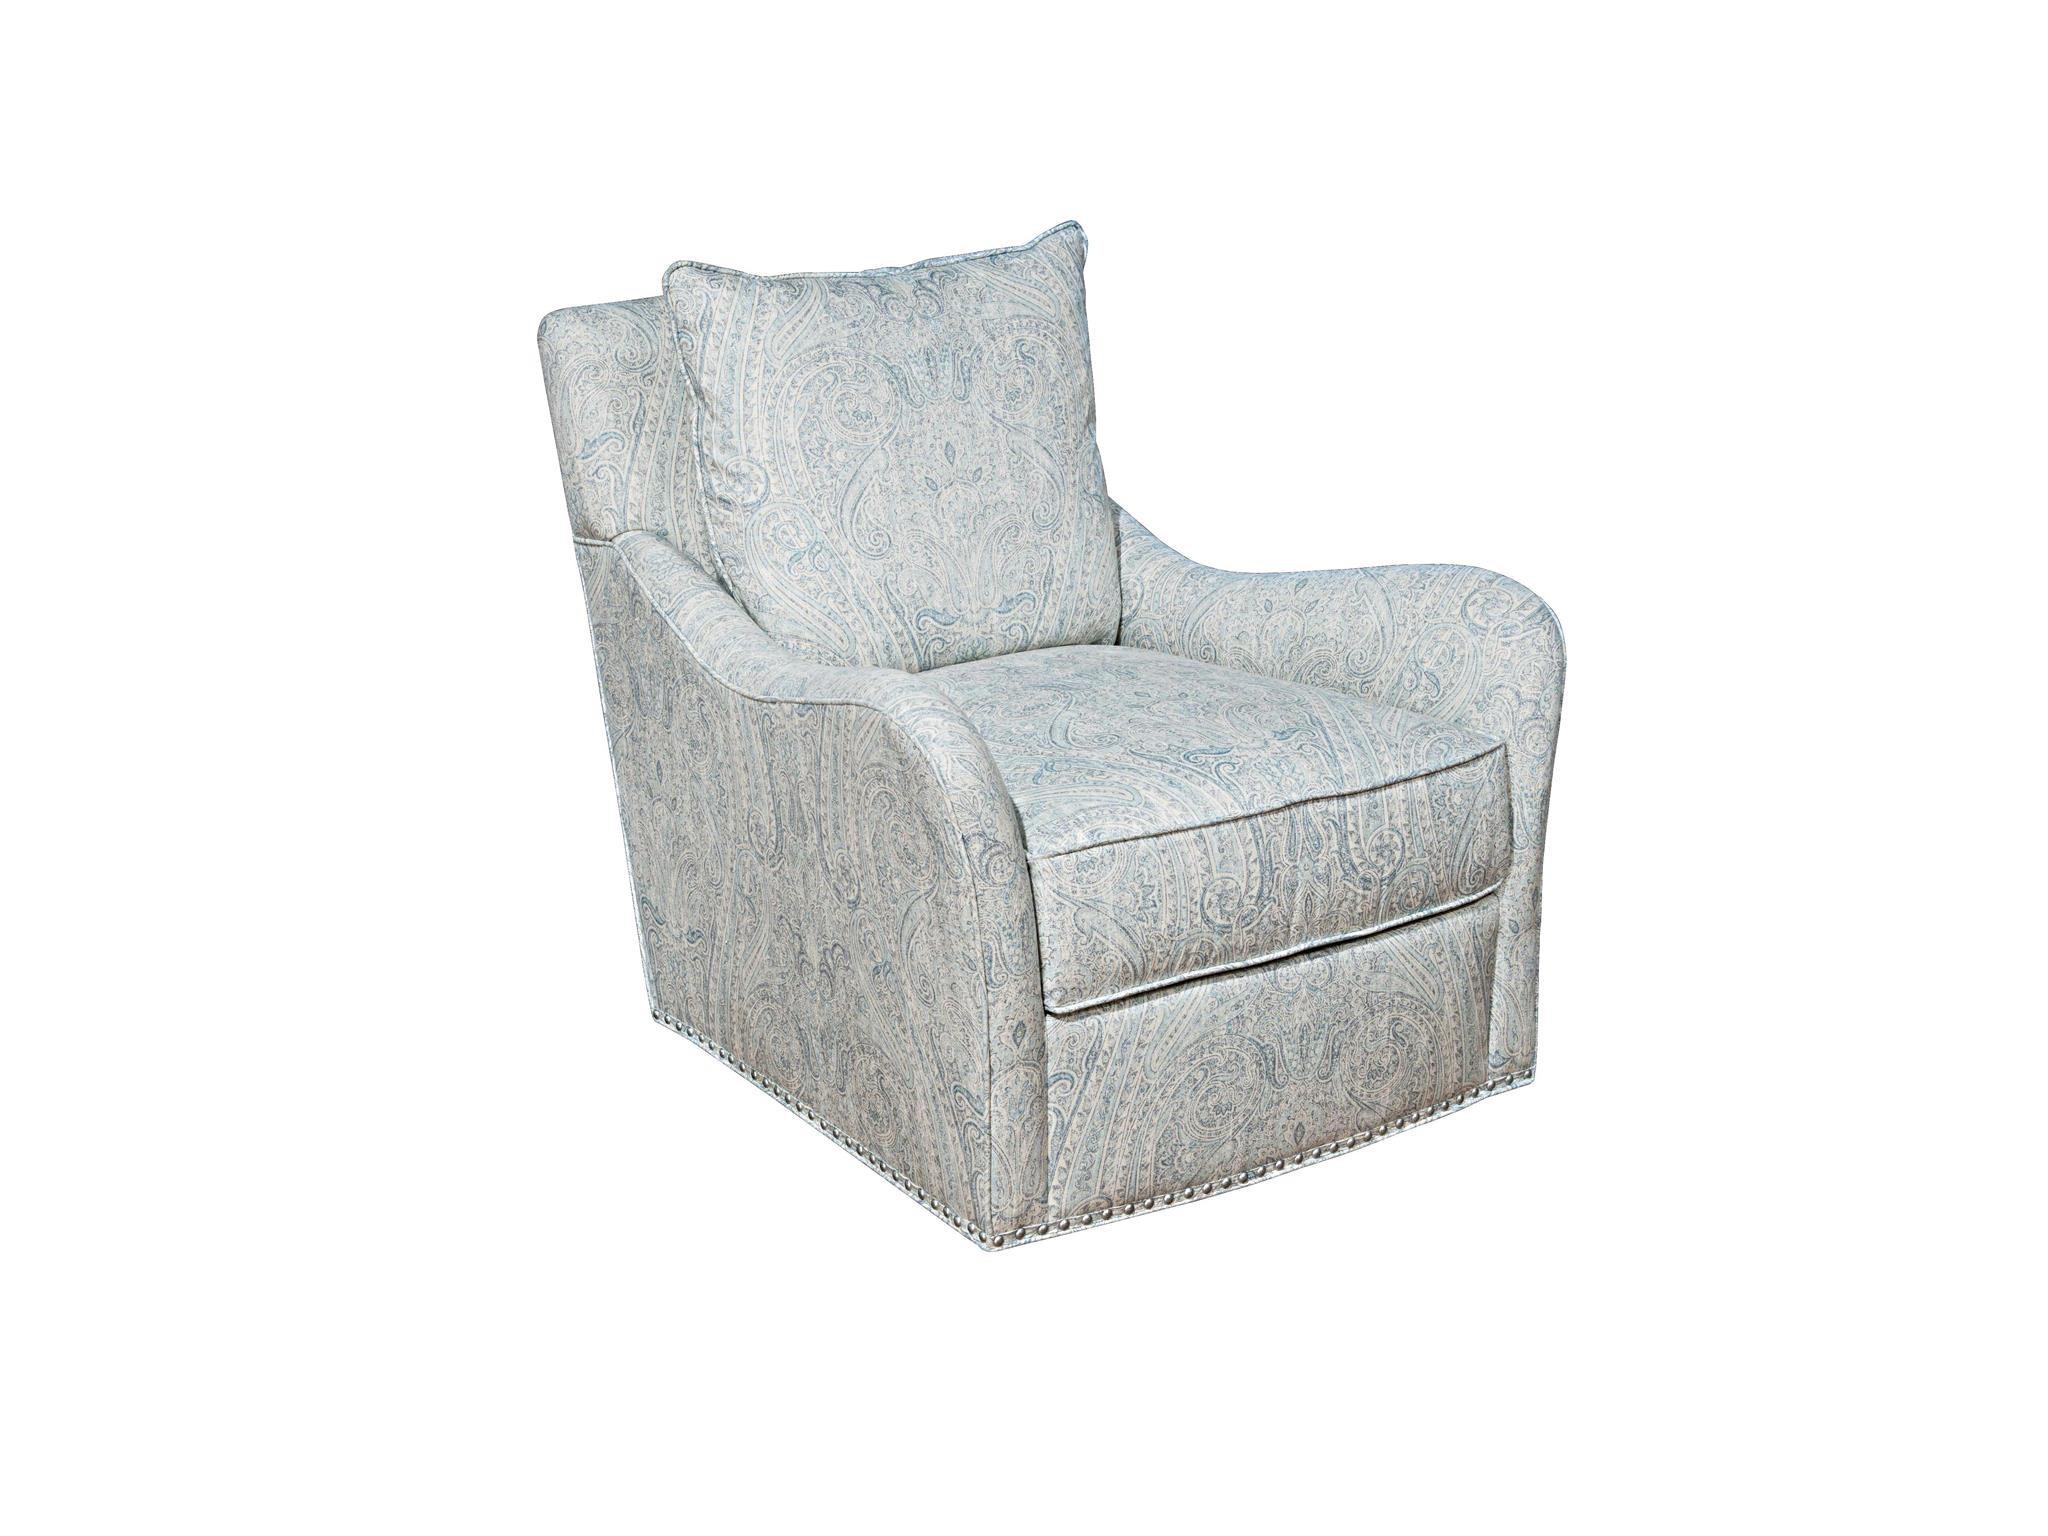 Fine Furniture Design Fraser Swivel Chair 5512 03